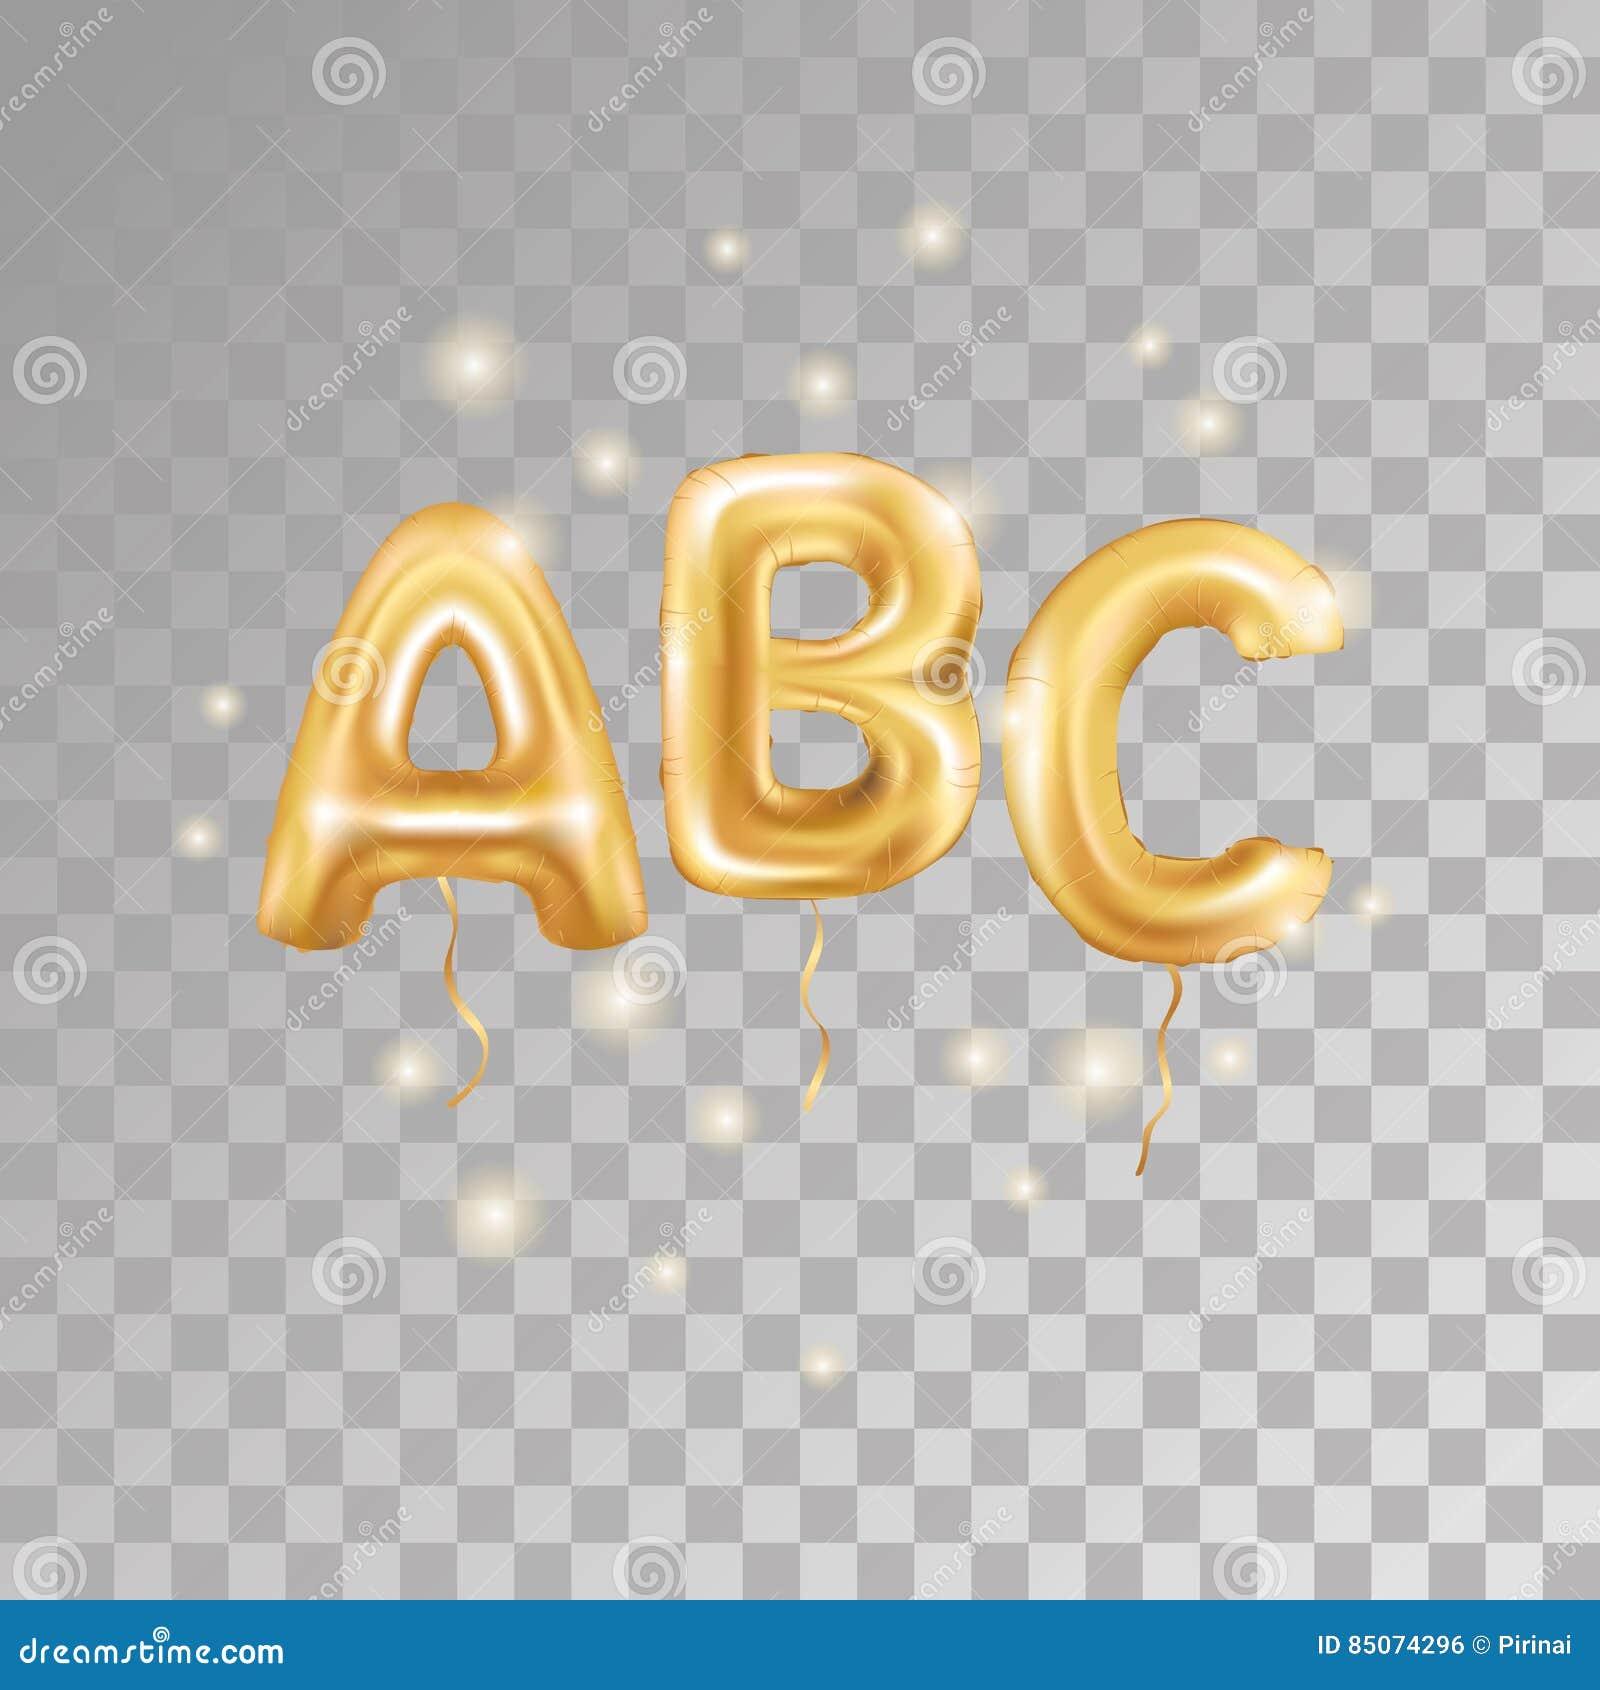 Golden Alphabet Balloon Logotype Icon Metallic Gold ABC Balloons Text For Childrens Reading Hornbook Letter Holiday Birthday Celebration